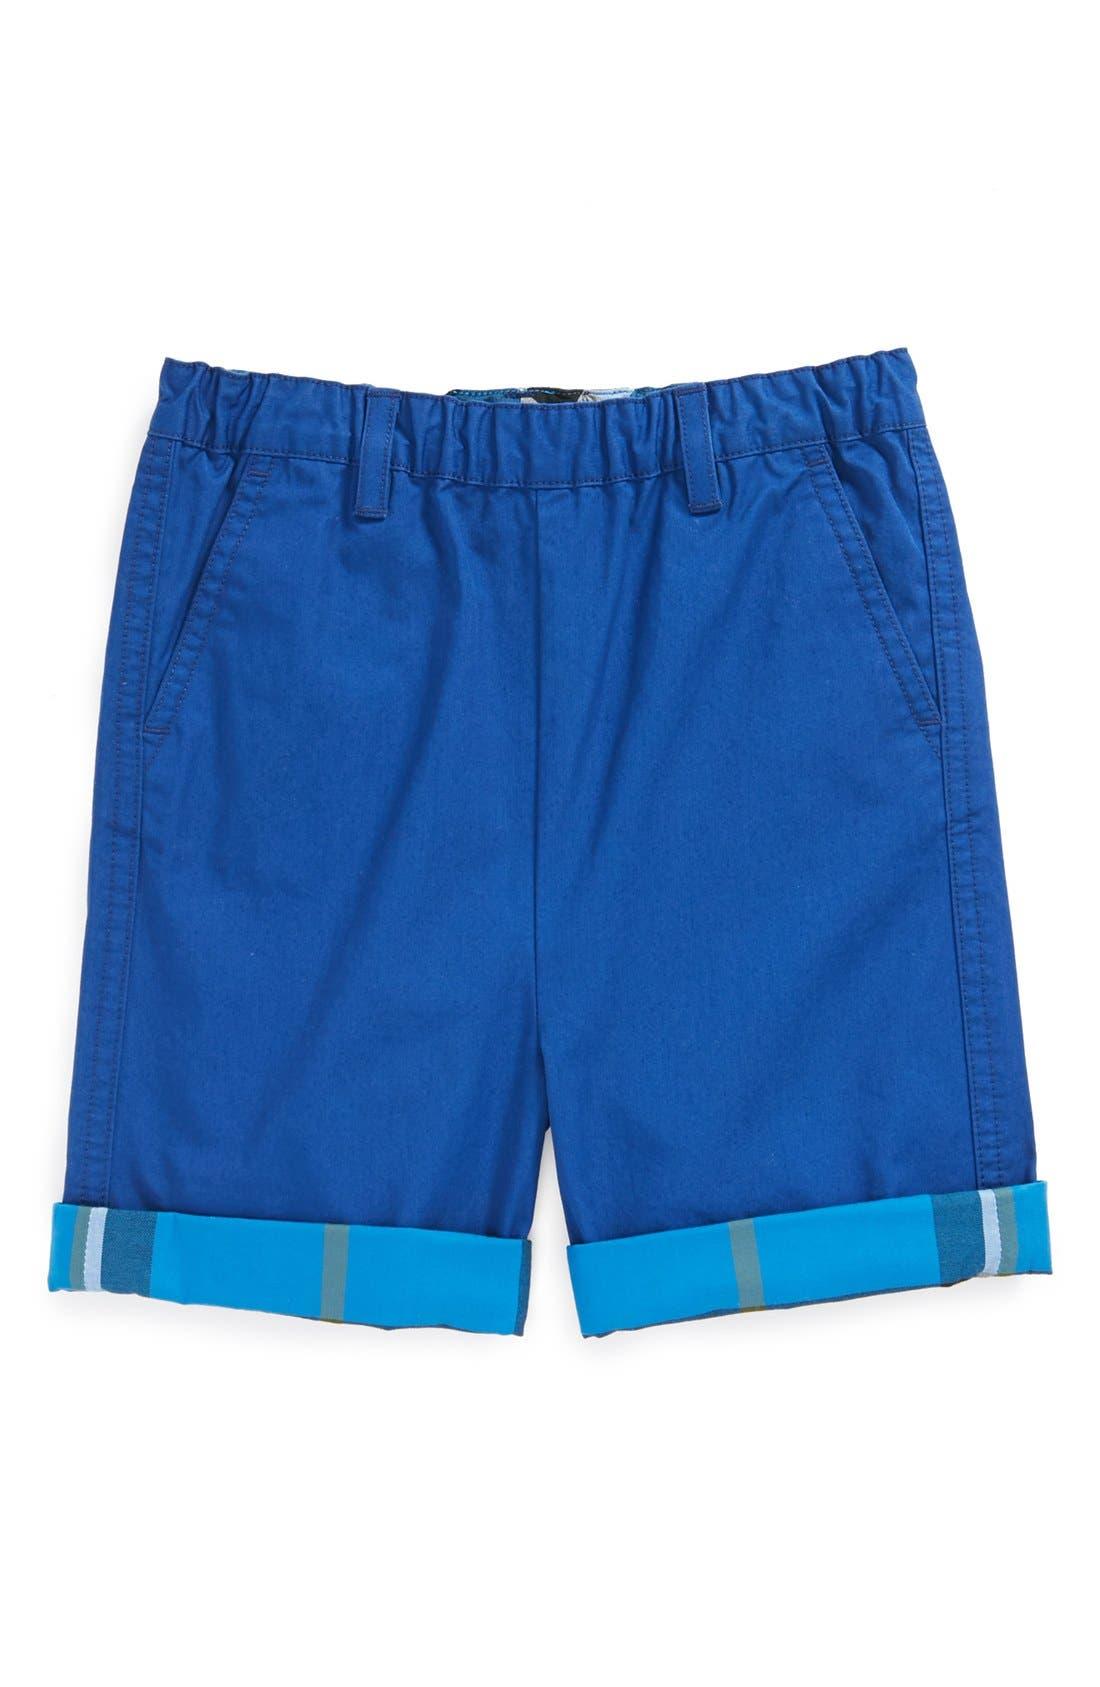 Main Image - Burberry 'Seth' Shorts (Toddler Boys)